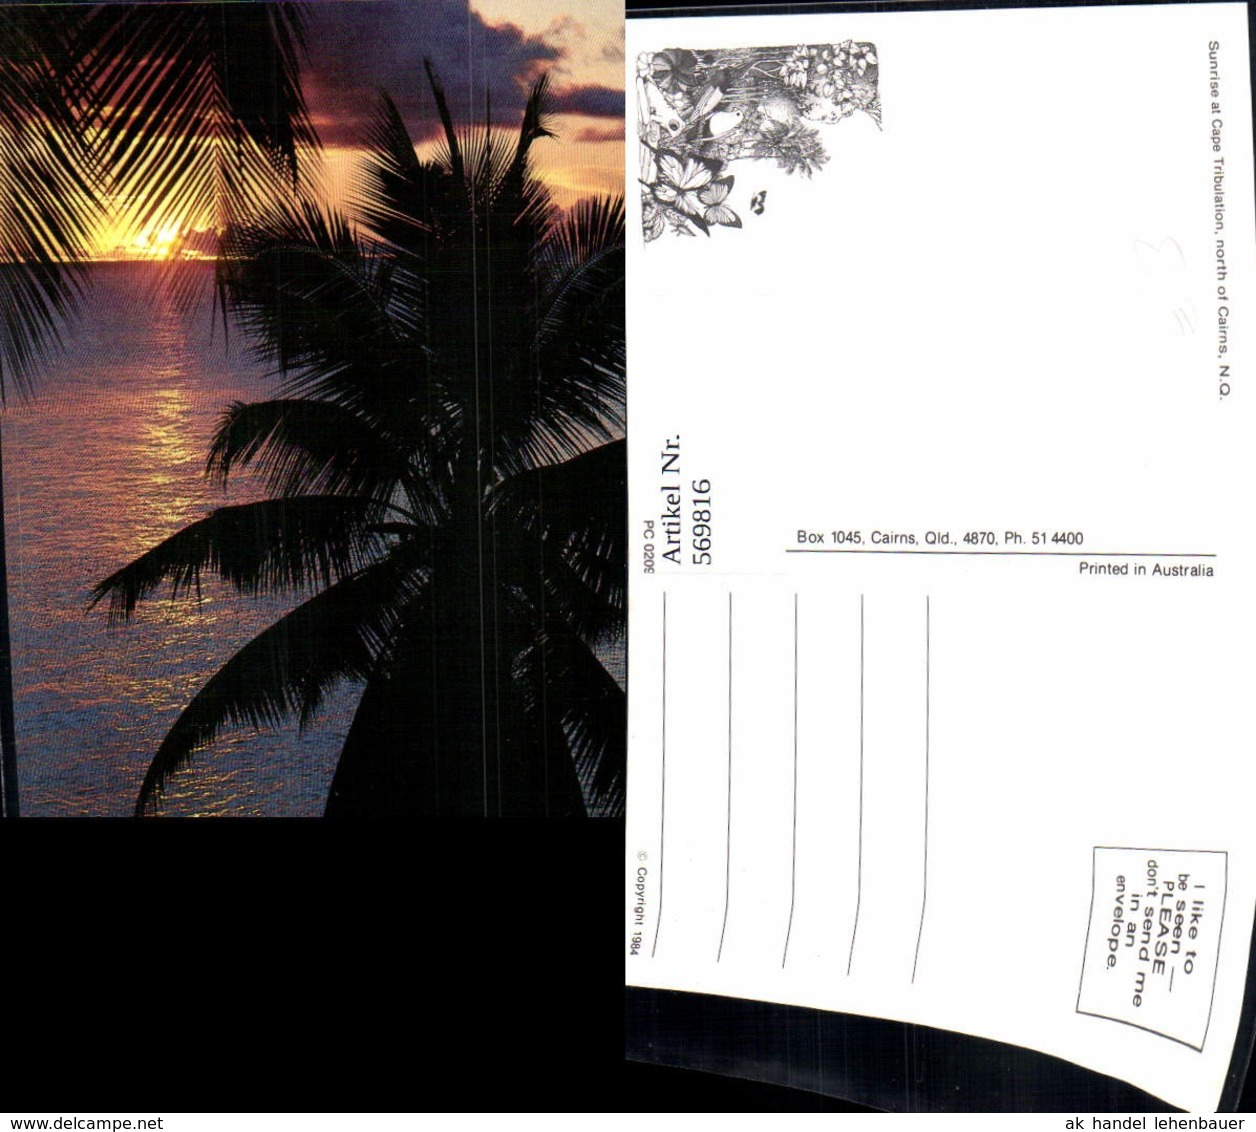 569816,Sunrise At Cape Tribulation North Of Cairns North Queensland Australien Austra - Cartoline